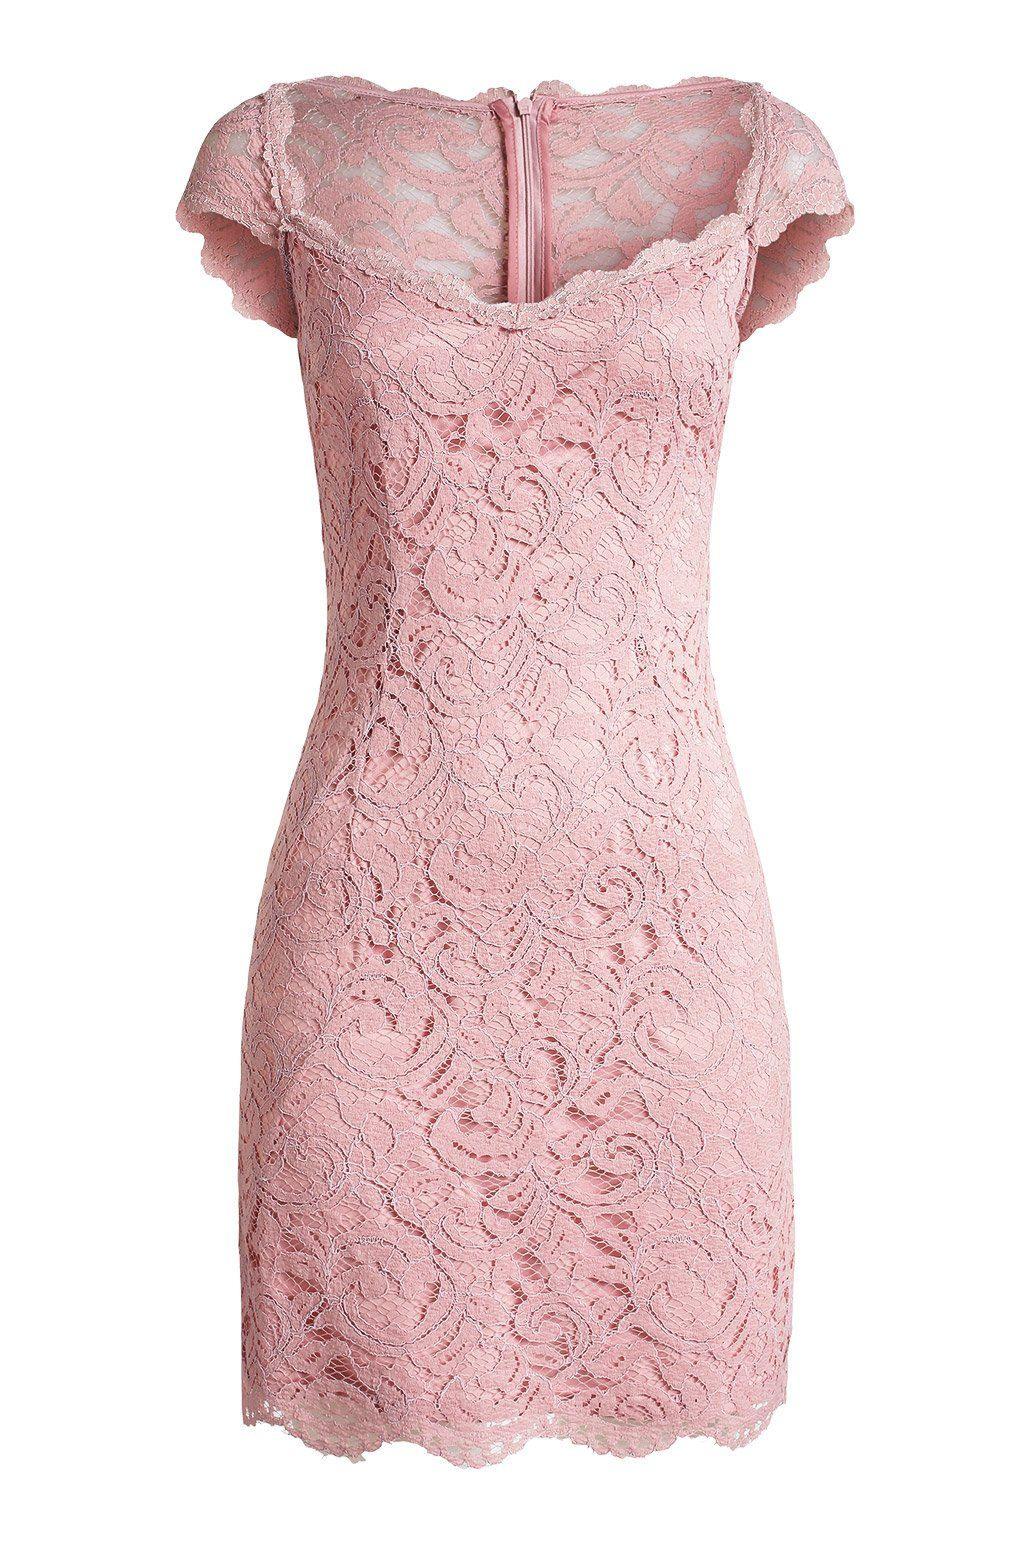 15 Coolste Kleid Spitze Rosa Boutique Luxus Kleid Spitze Rosa Boutique